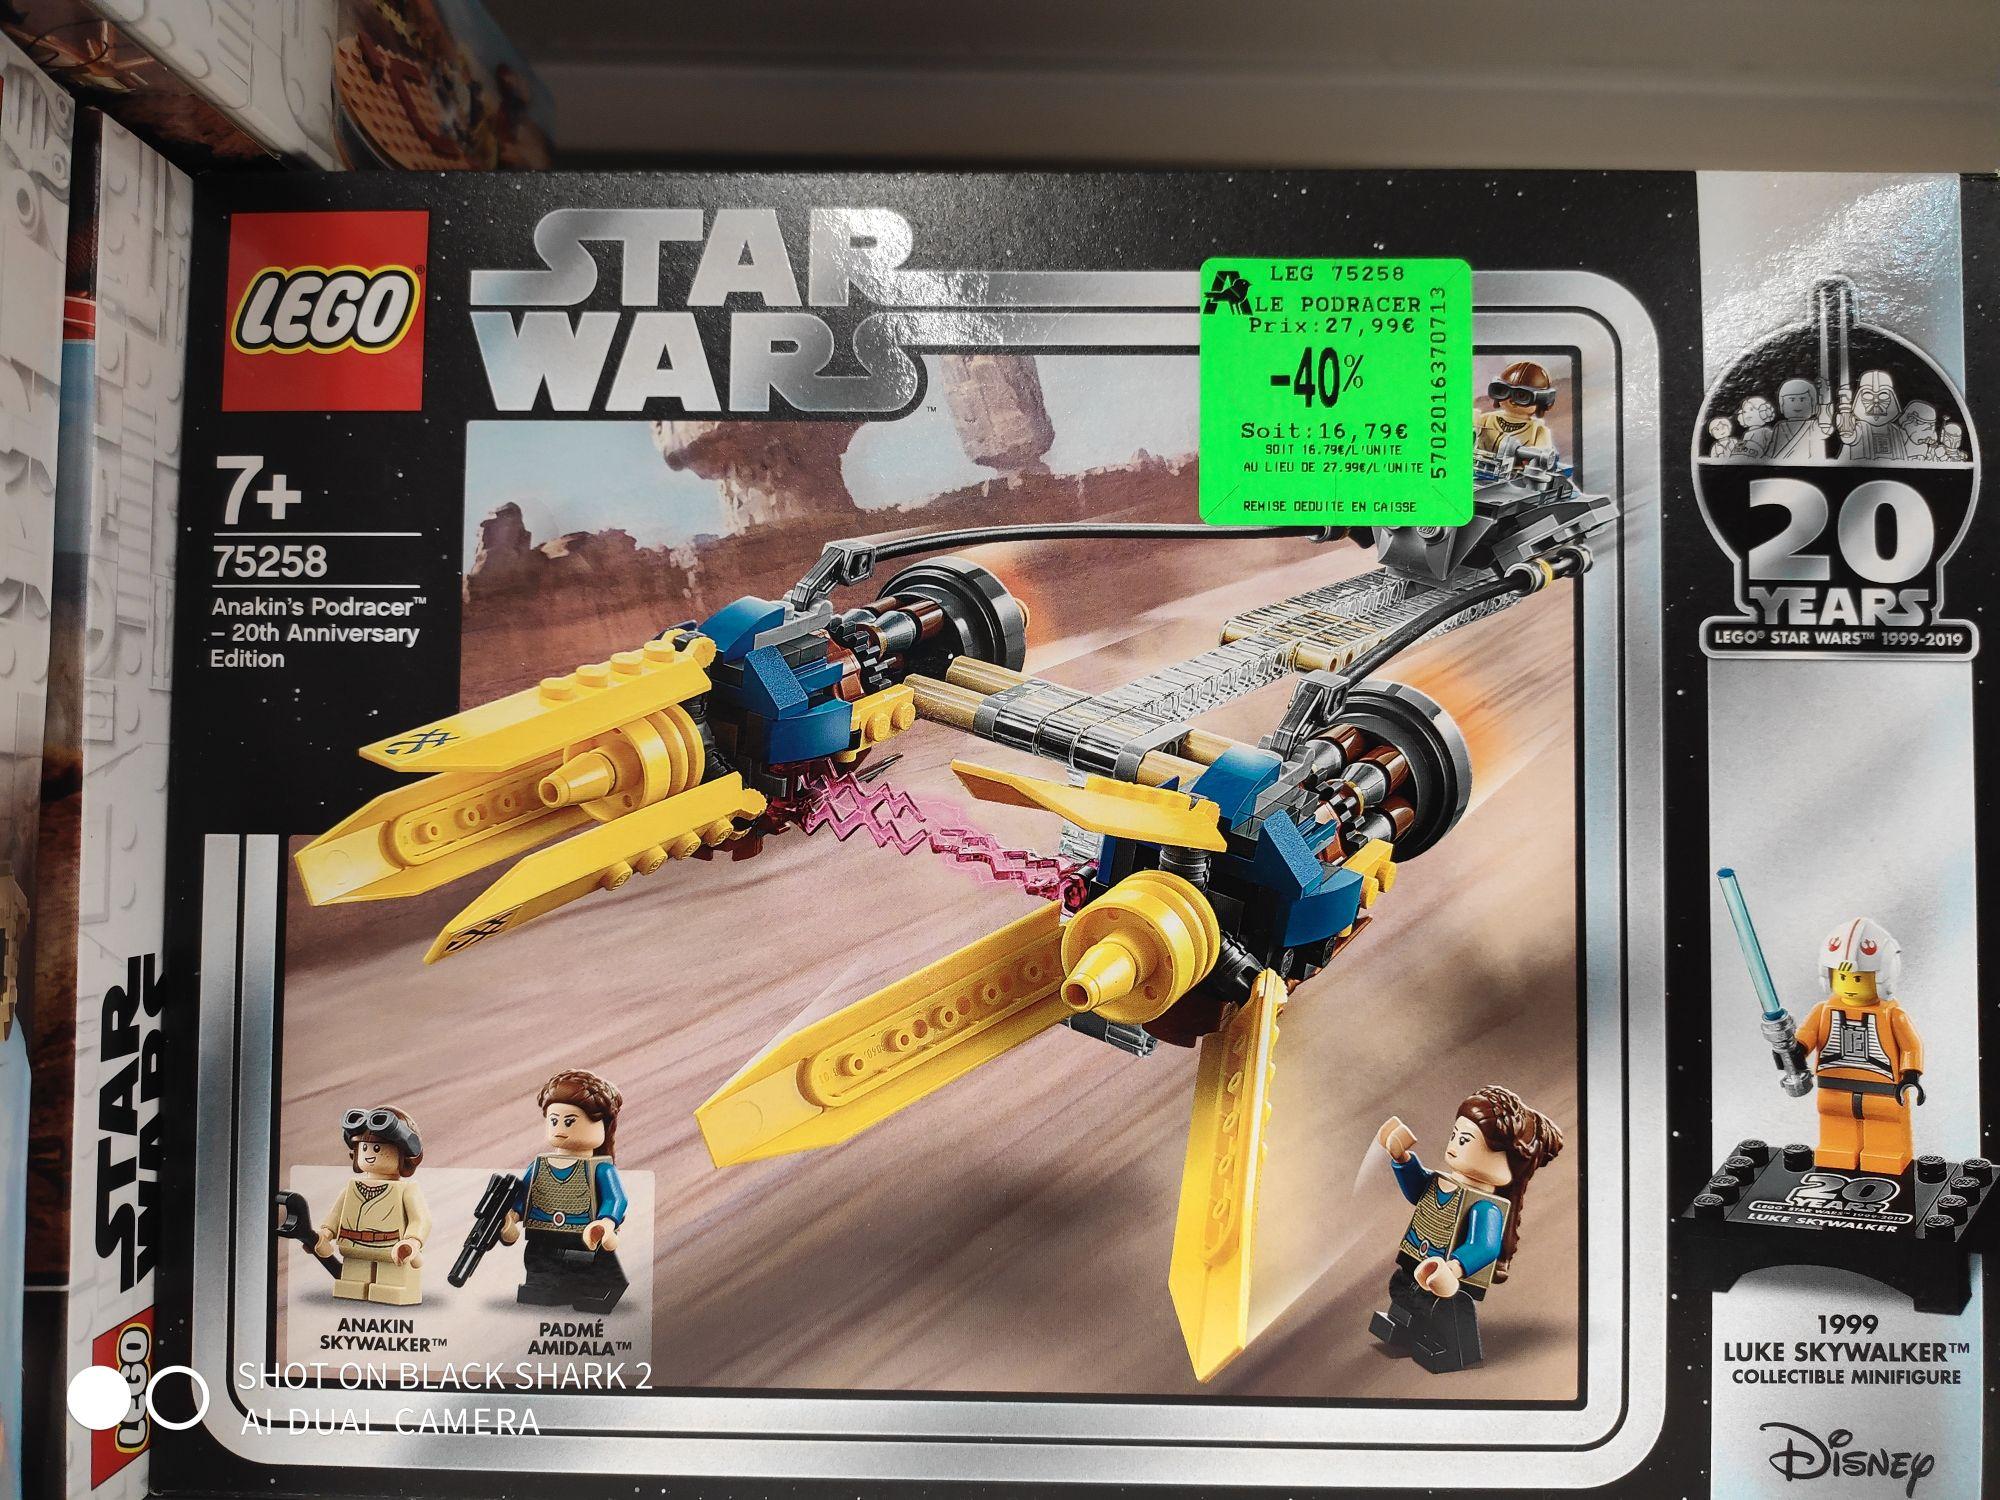 Jeu de construction Lego Star Wars : Le Podracer d'Anakin n°75258 - Viry Noureuil (02)